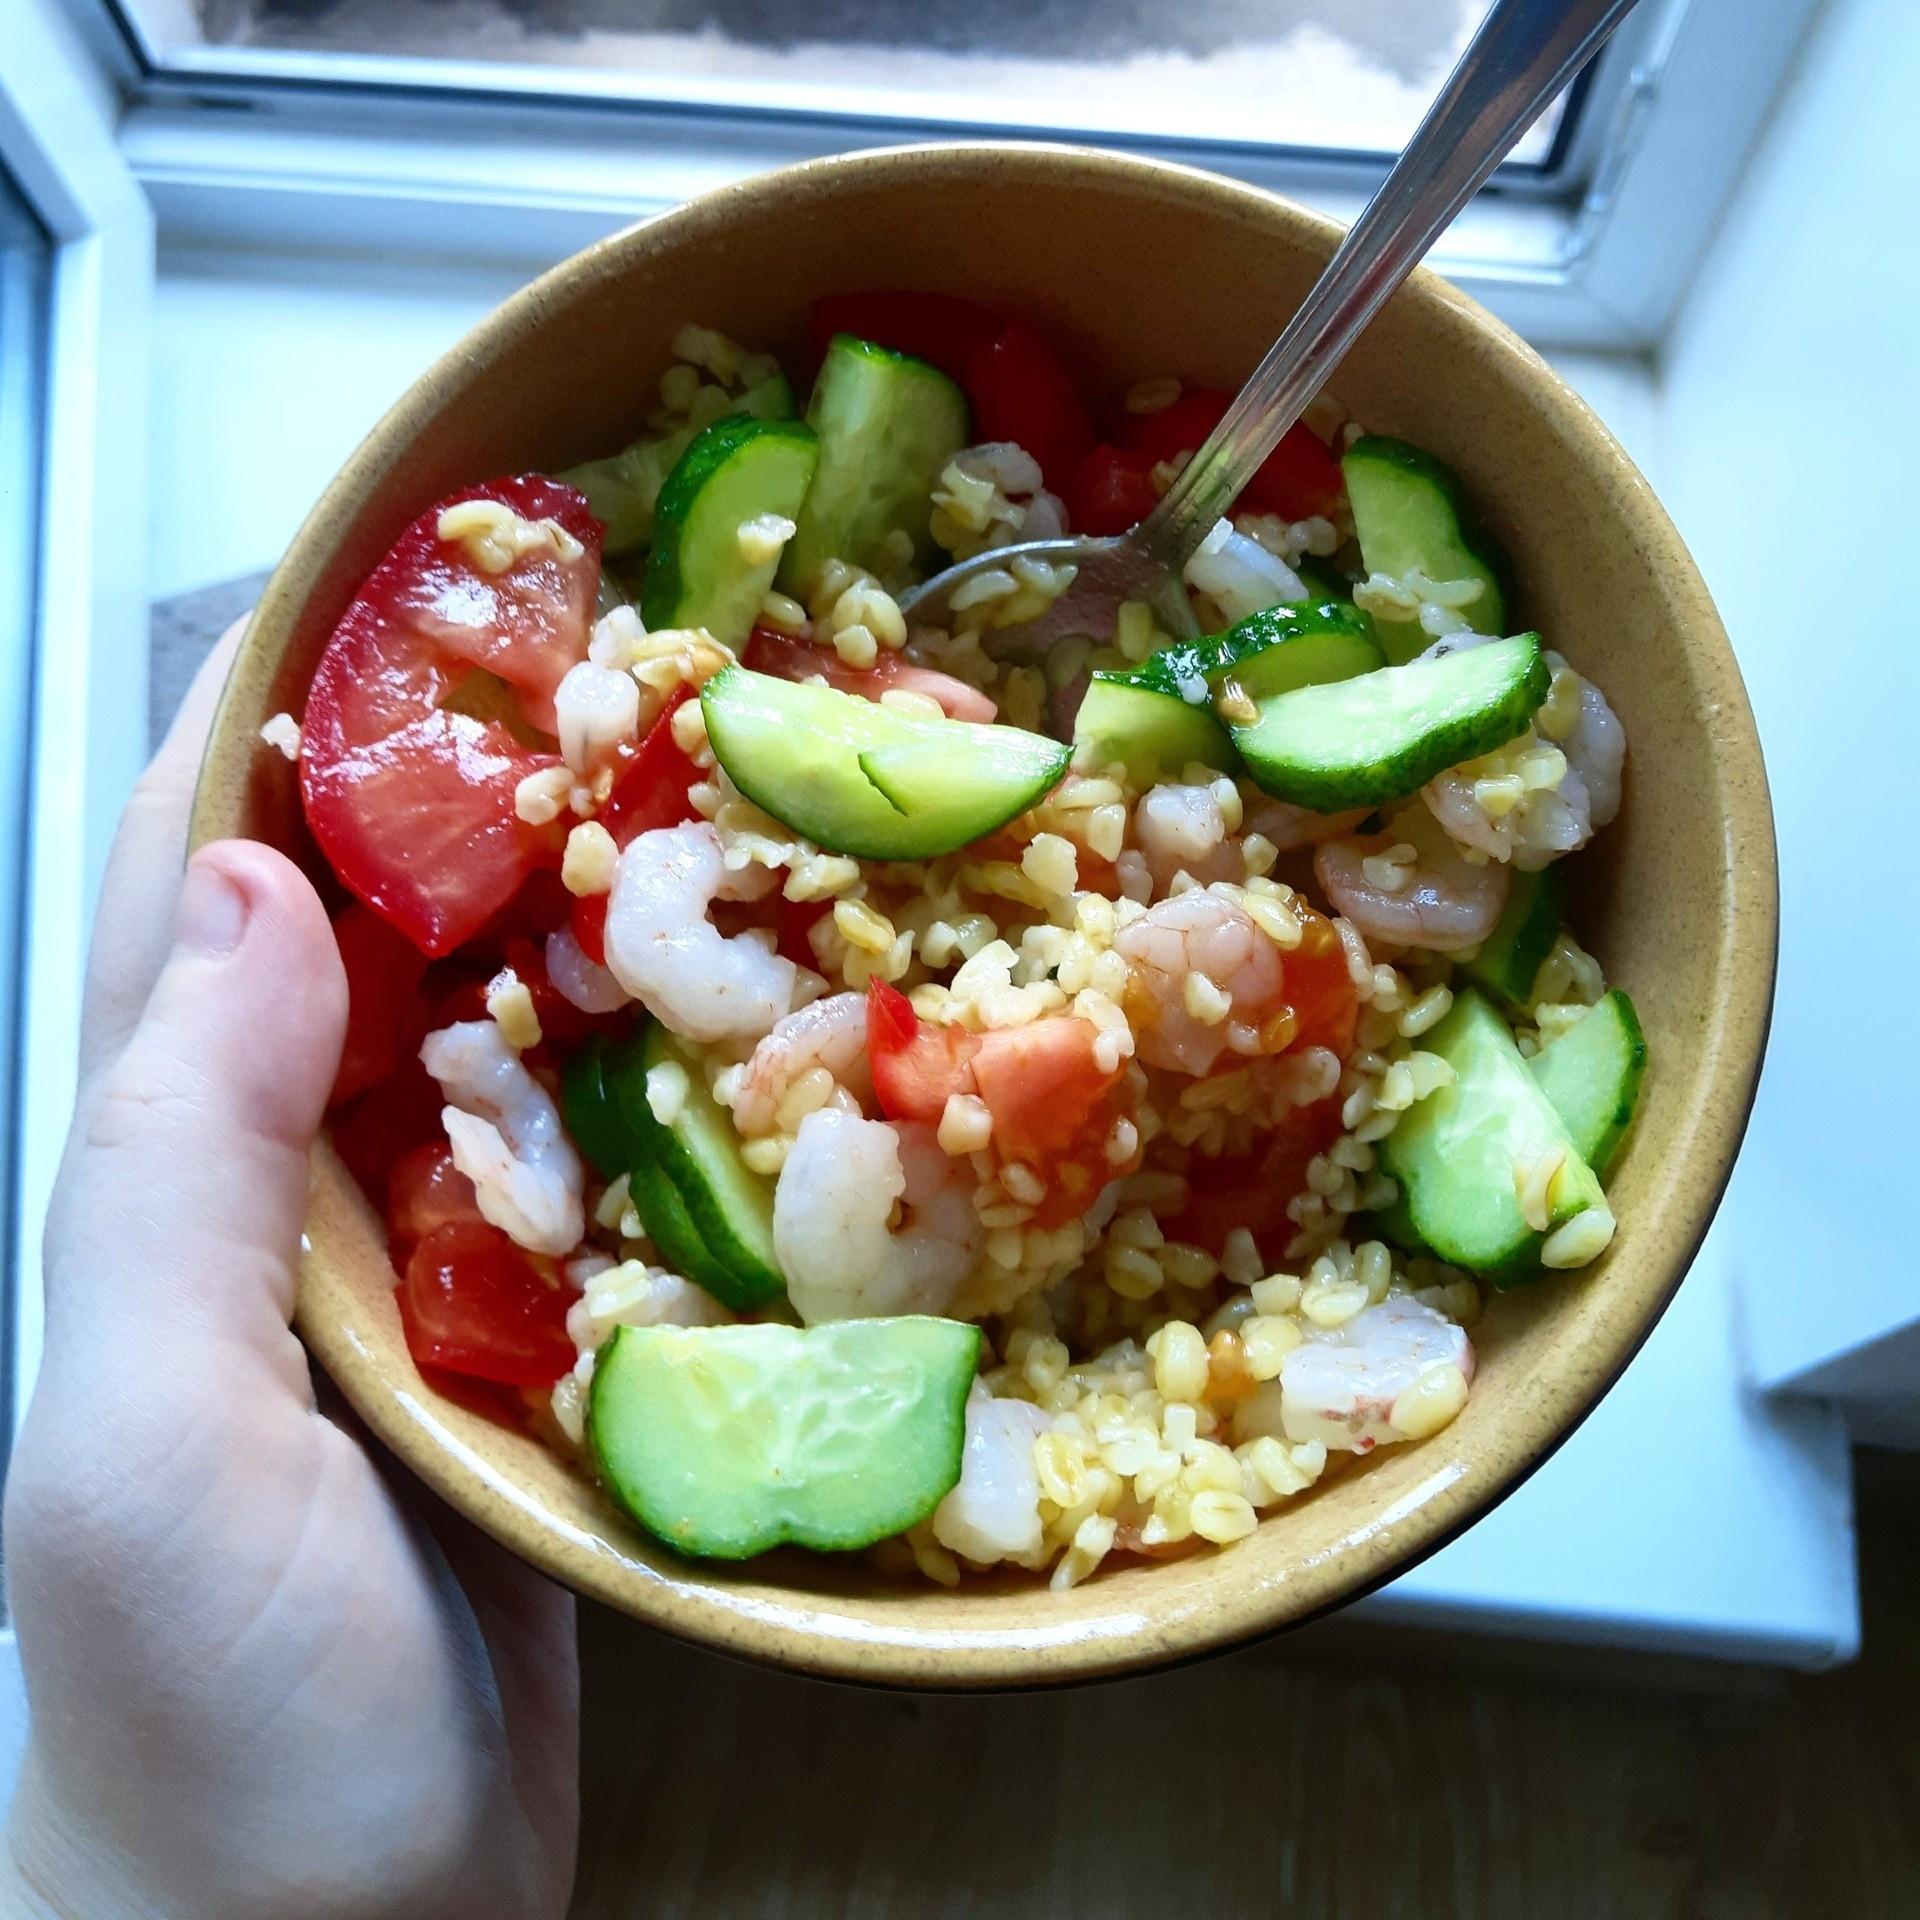 sytnyj-salat-s-krevetkami.jpg